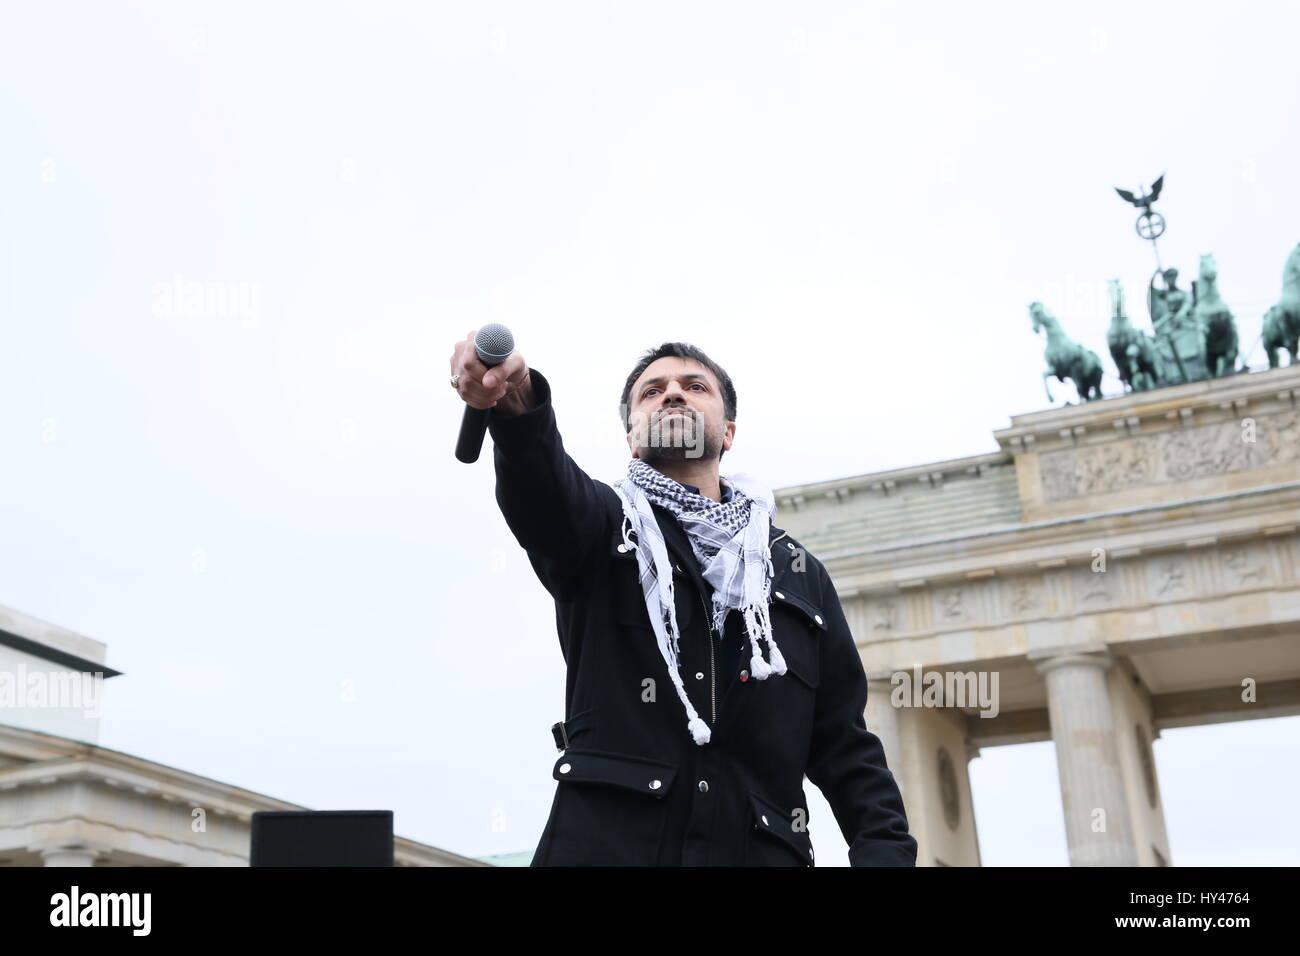 Berlin, Germany, April 8th, 2105: Rally on International Roma day at Brandenburg Gate. - Stock Image